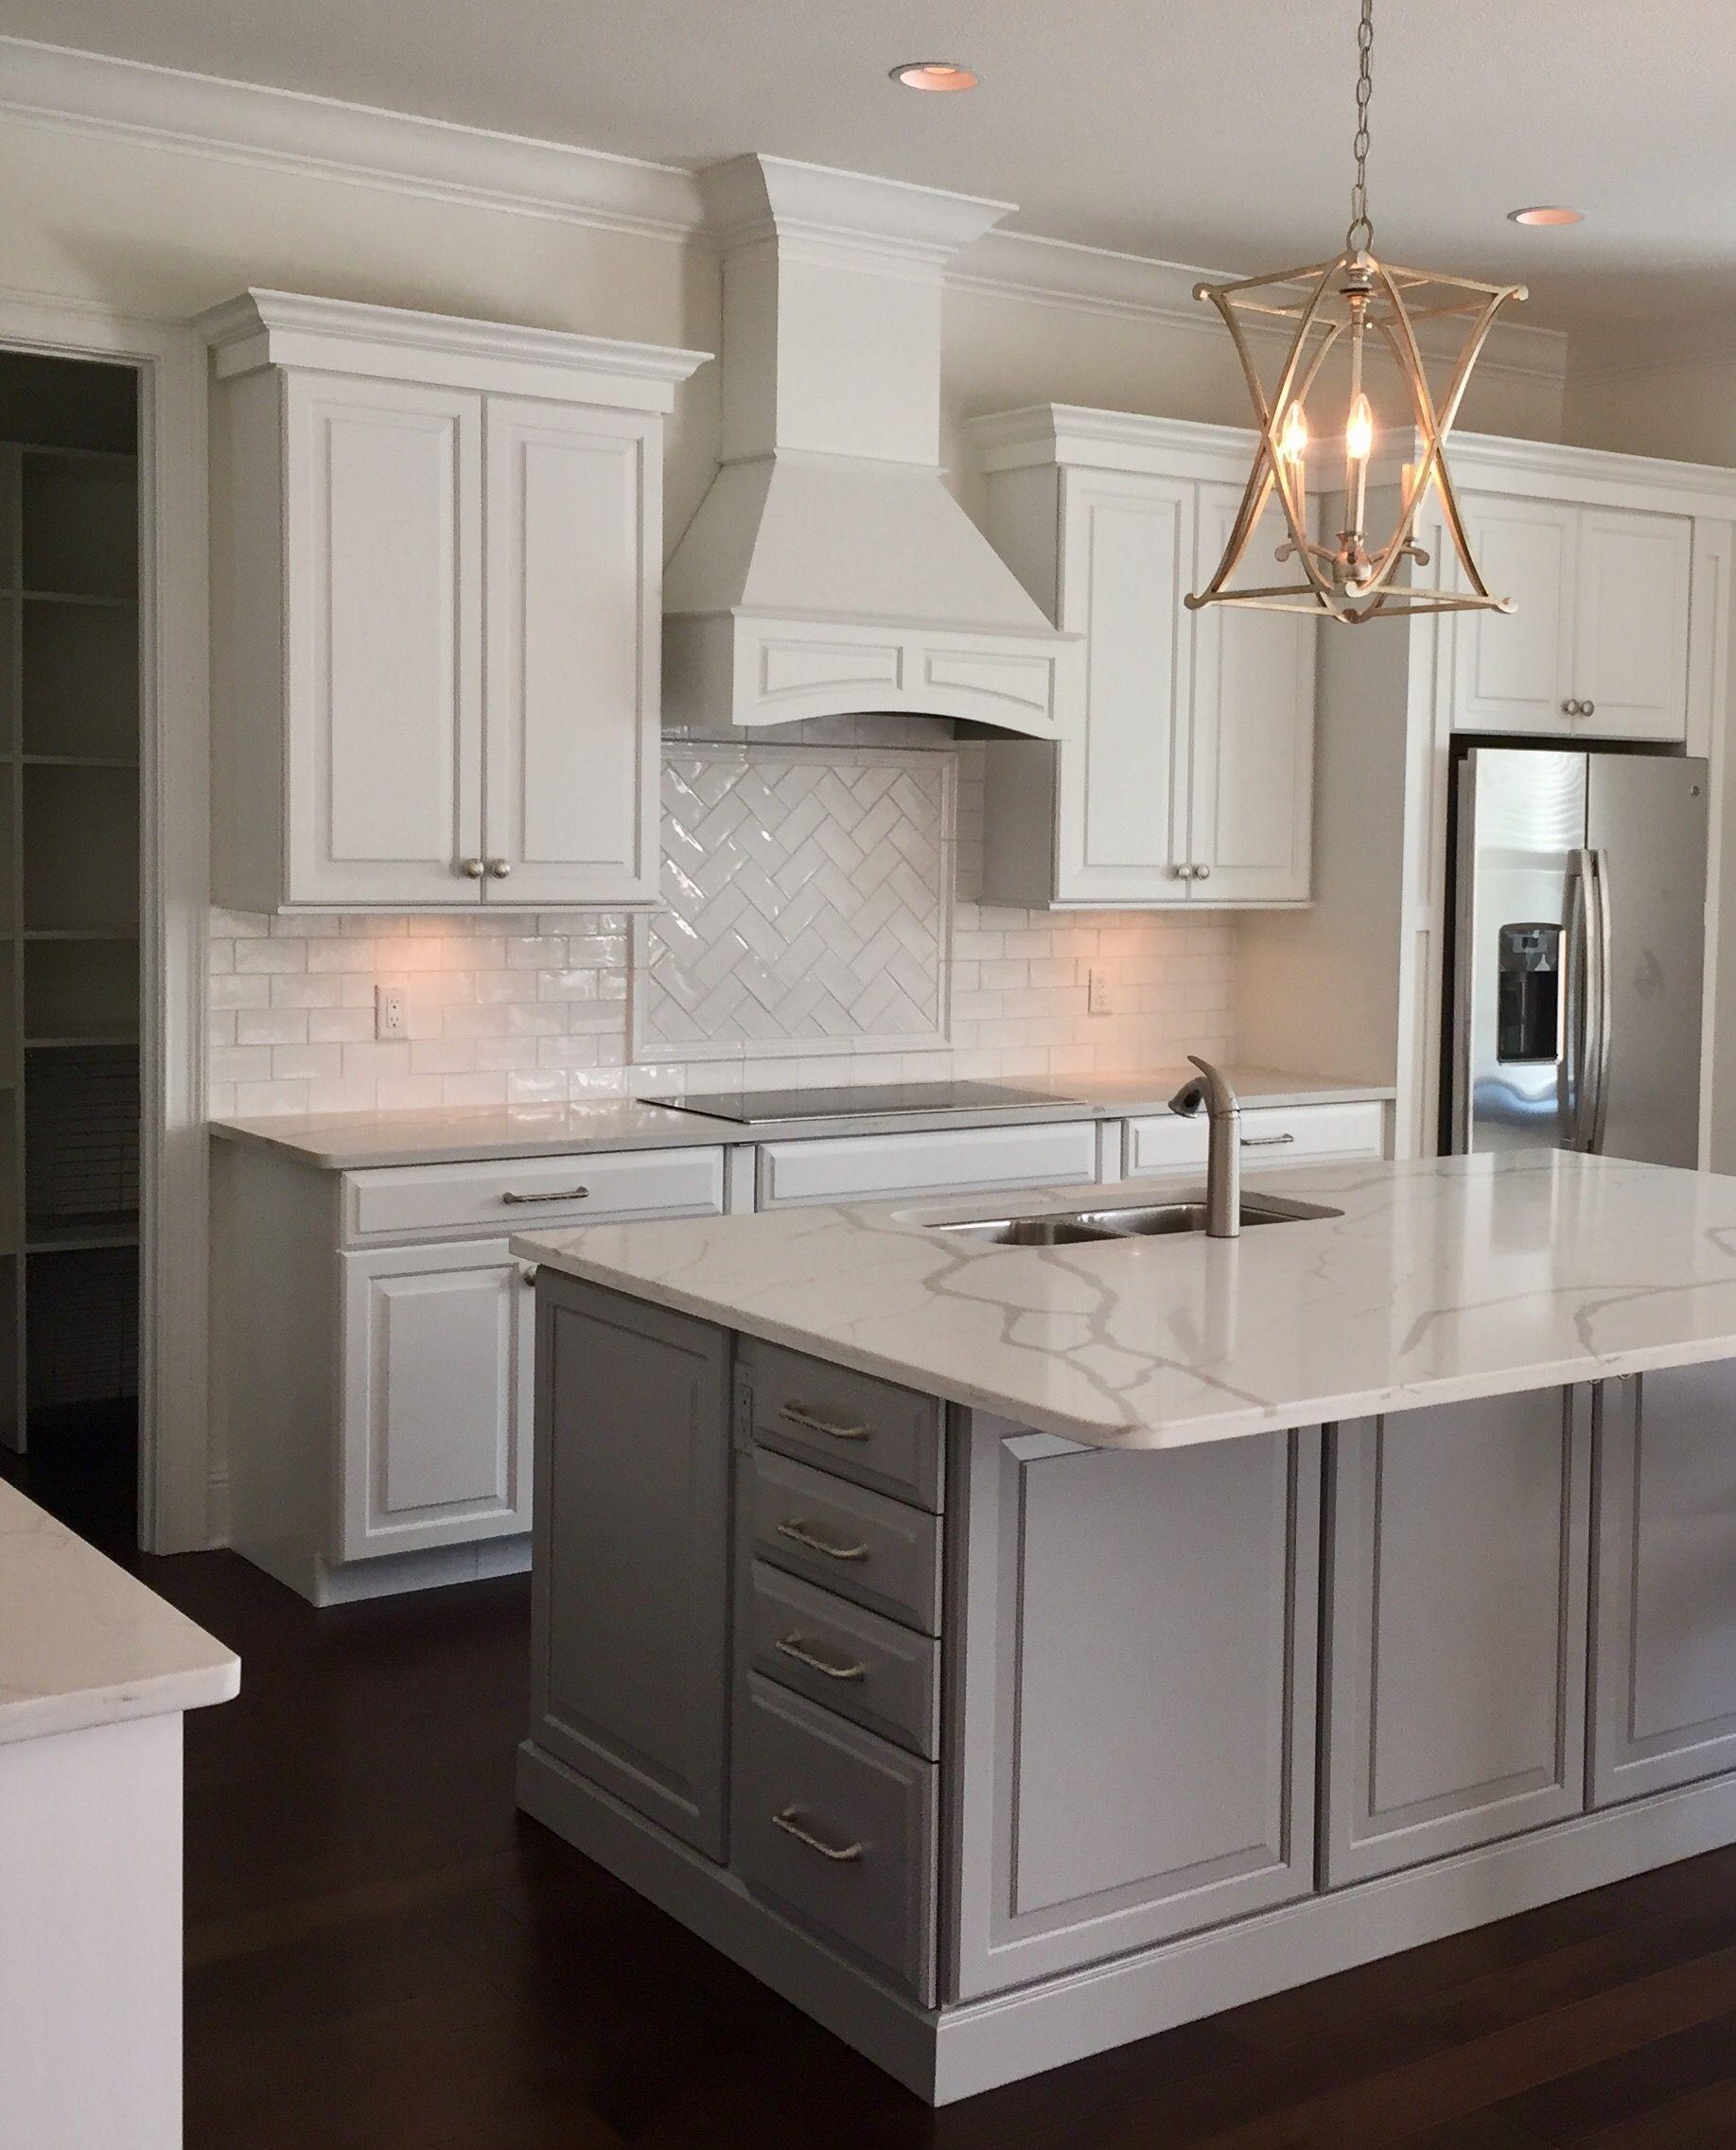 Angled Cabinets Grey Island Islands Kitchen Angled Cabinets Grey Isl In 2020 Grey Kitchen Island Kitchen Cabinets Grey And White White Kitchen Design